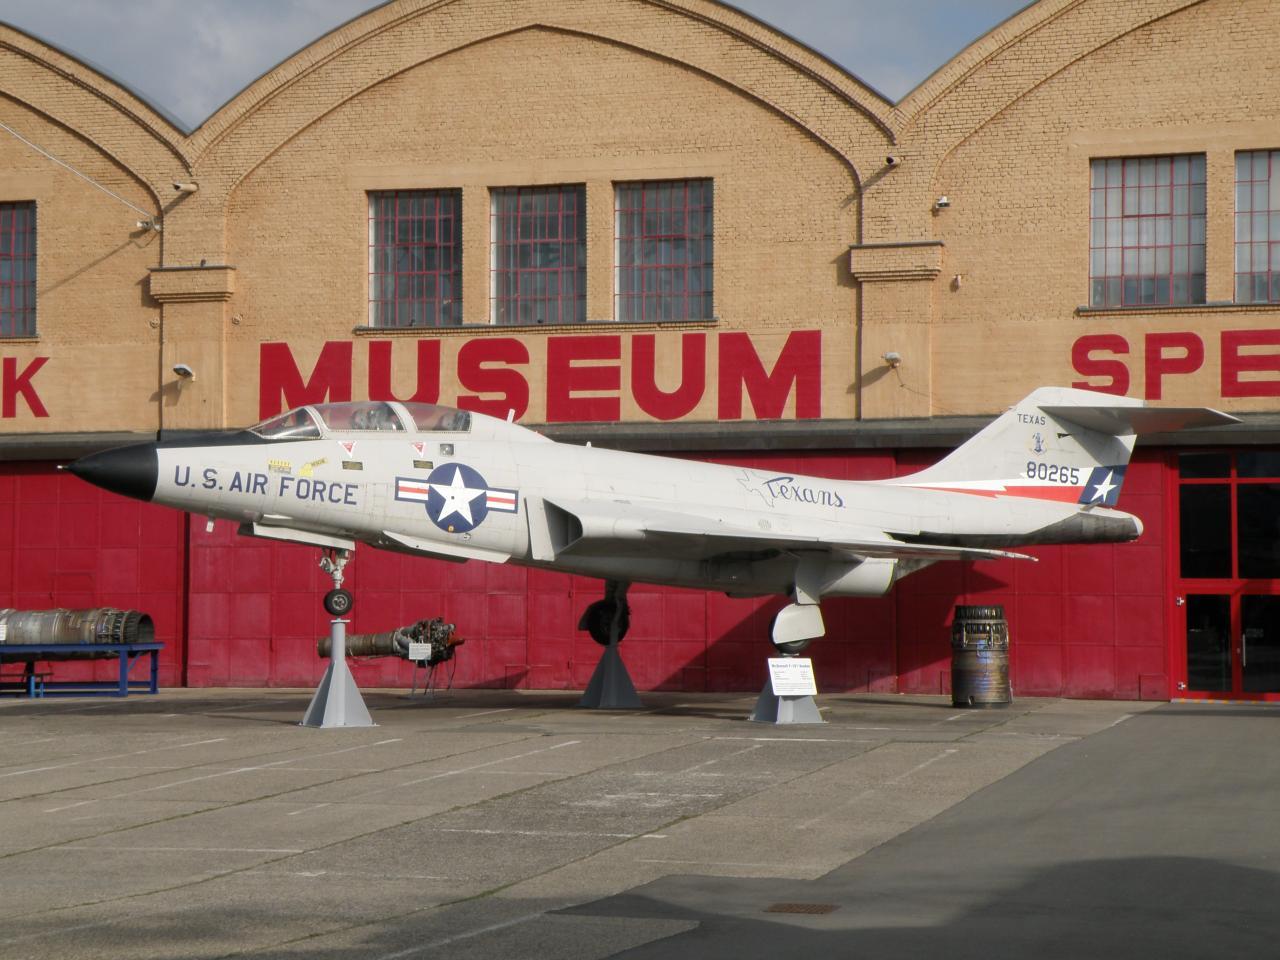 Mc Donnell Douglas F-101